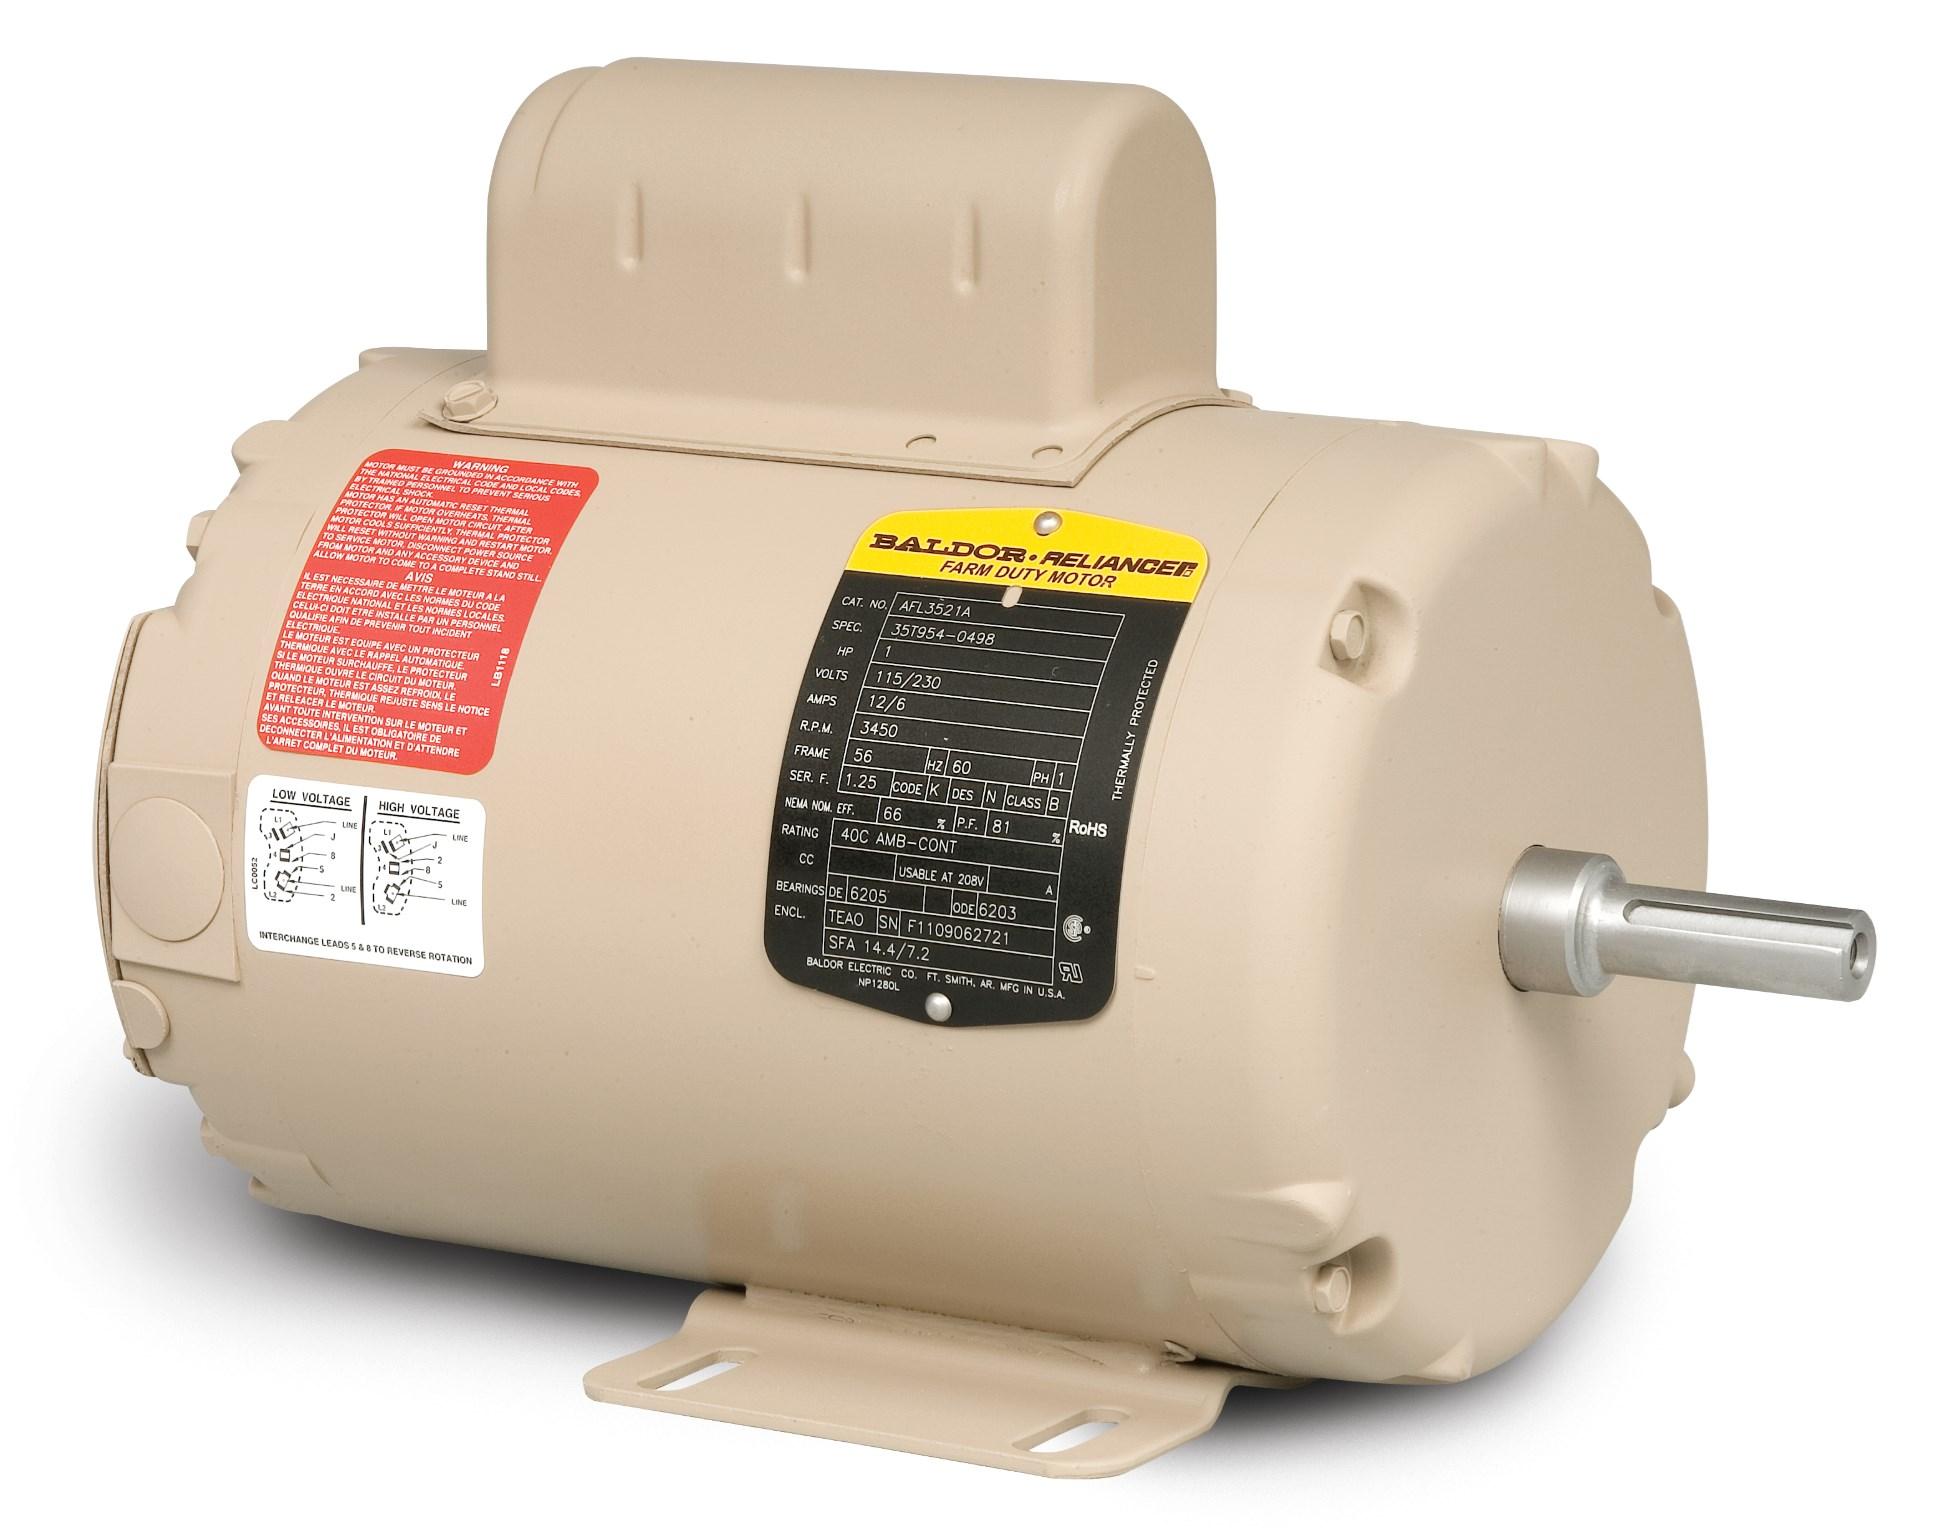 213t Electric Motor 1 Phase Farm Duty Wiring Diagram 52 Baldor Pump Imagebcwhiteas1h256w256 Com At